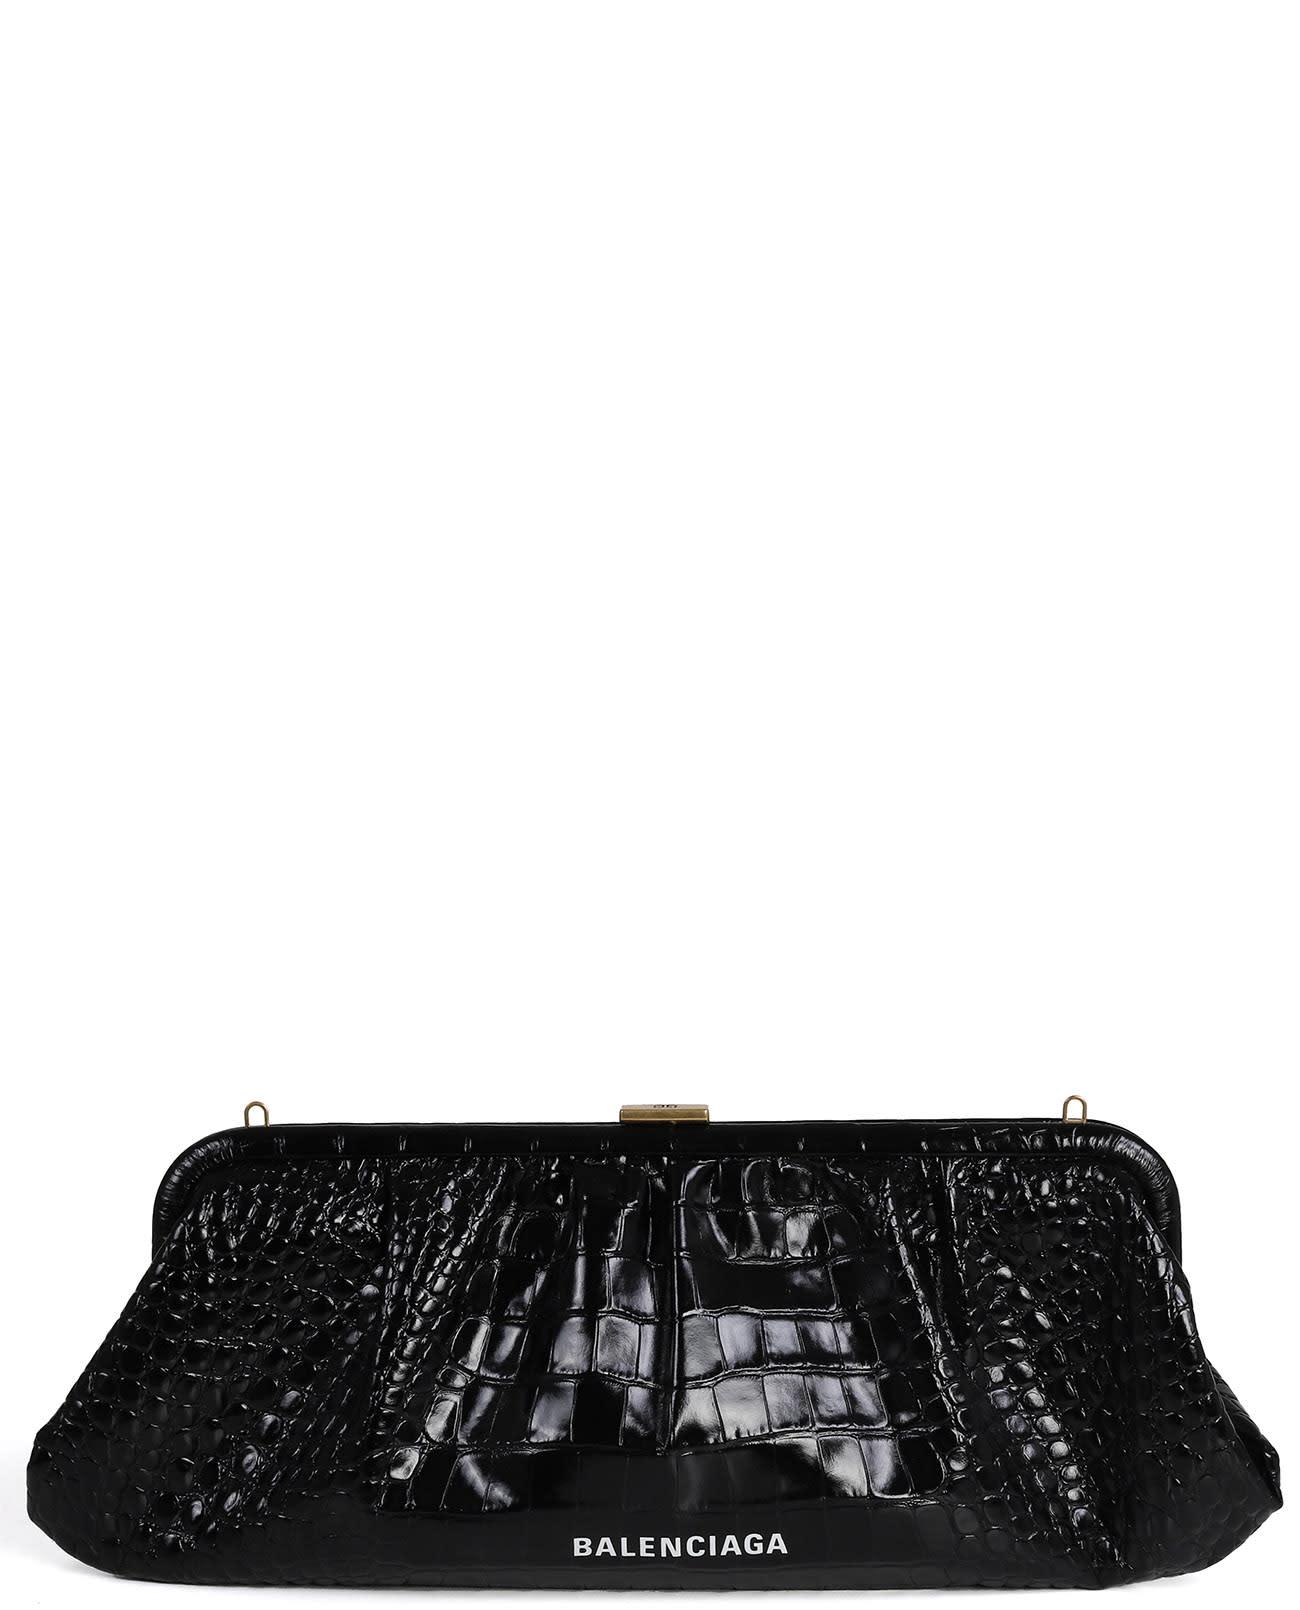 Balenciaga BLACK CLOUD XL